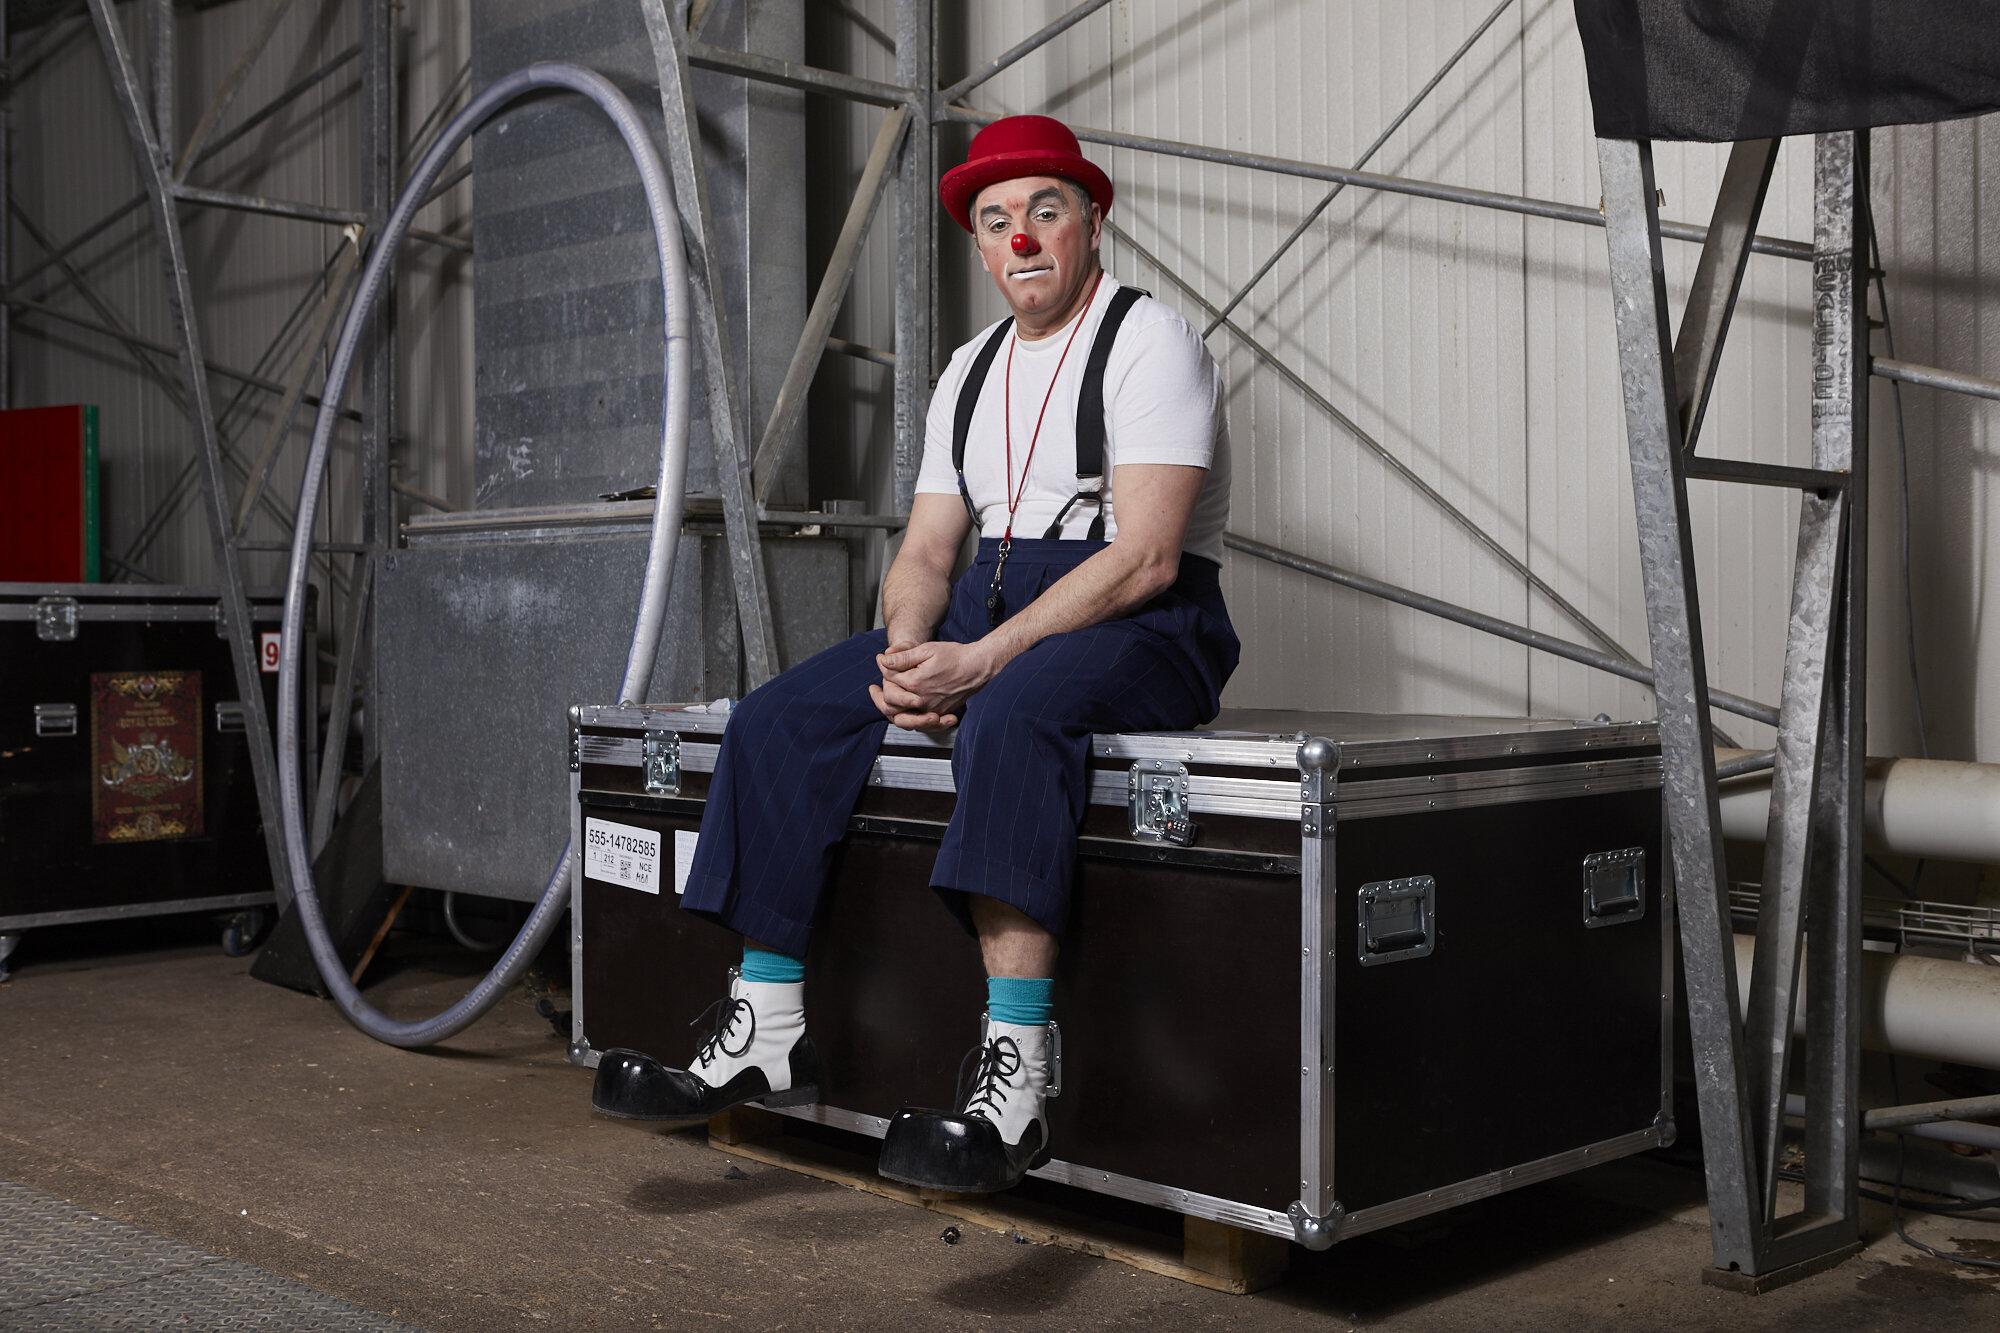 monaco-montecarlo-circus-international-festival-circusphotography-circus-photographer-reportage-documentaryportrait-chapiteau-nick-warner-london